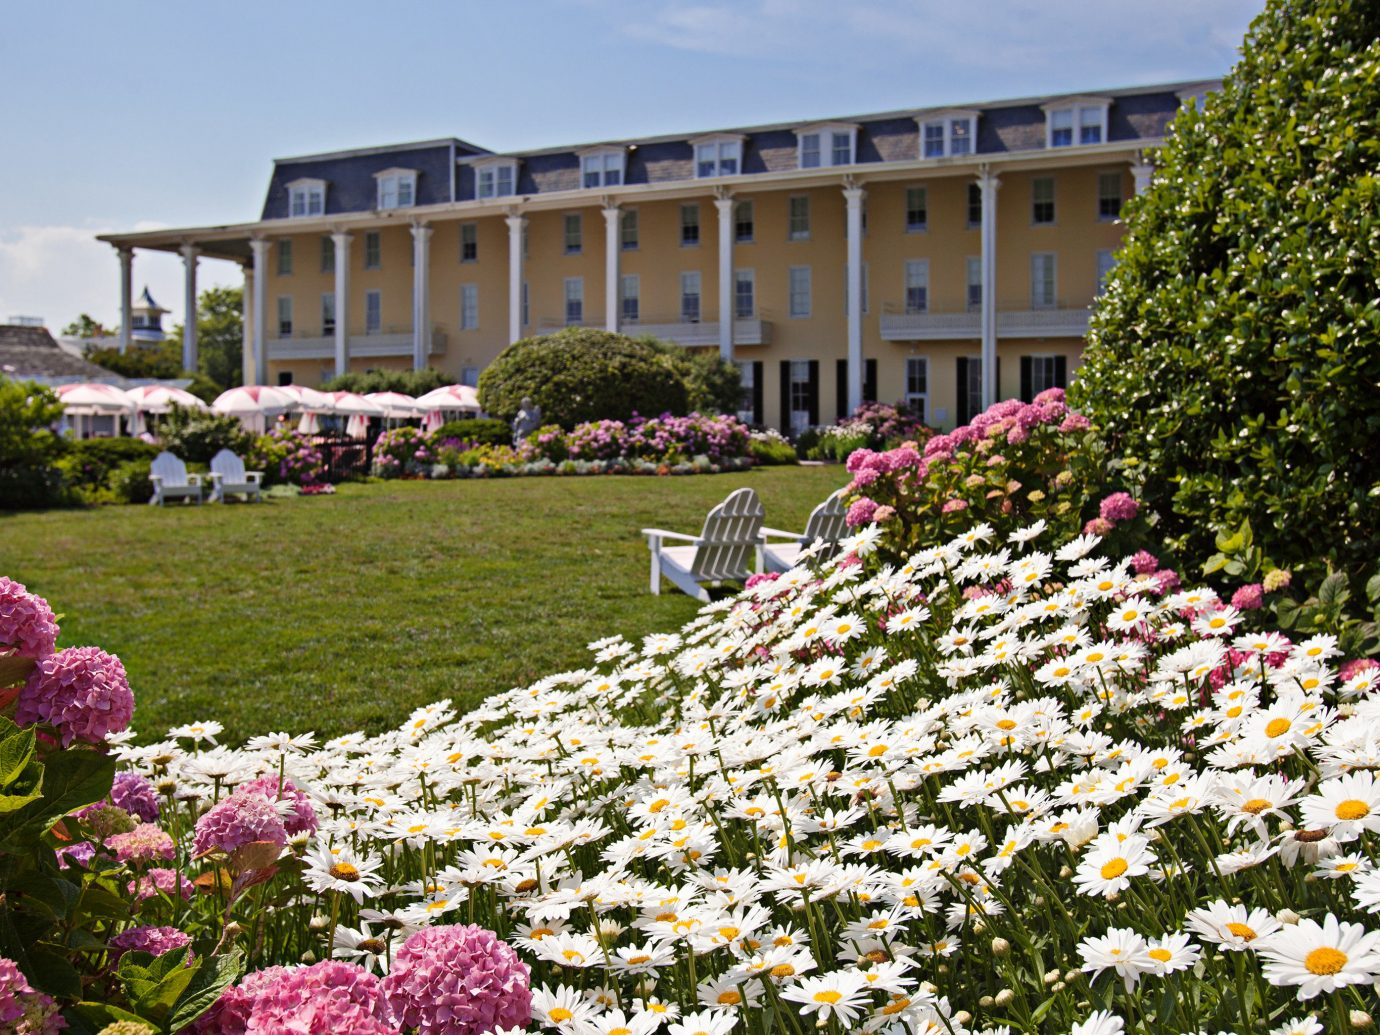 Exterior Garden Grounds Historic Hotels outdoor flower grass flora plant botany floristry estate lawn botanical garden park crowd